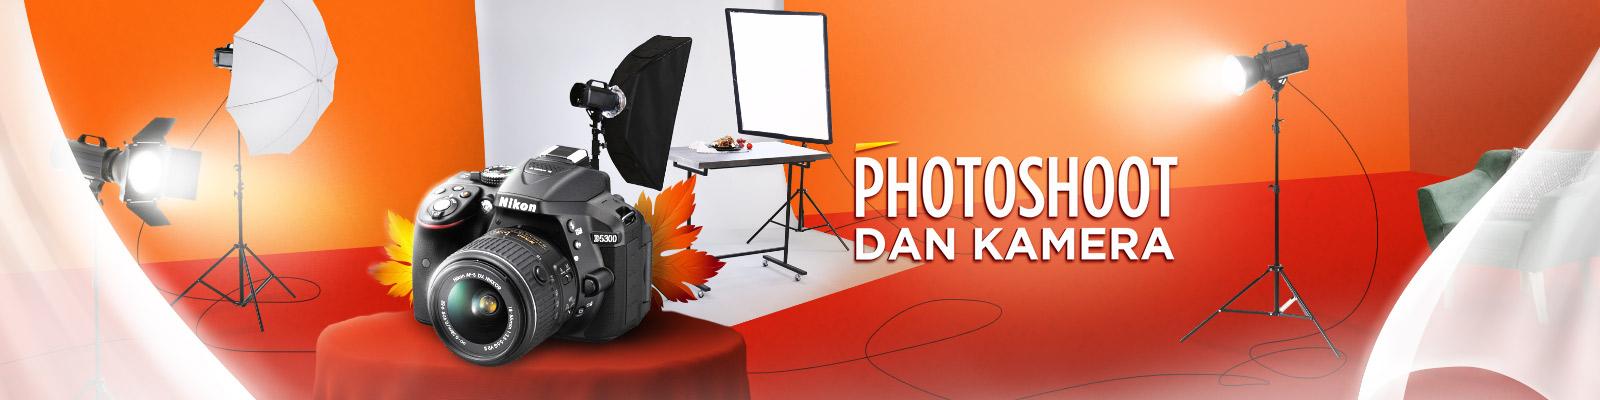 Photoshoot dan Kamera